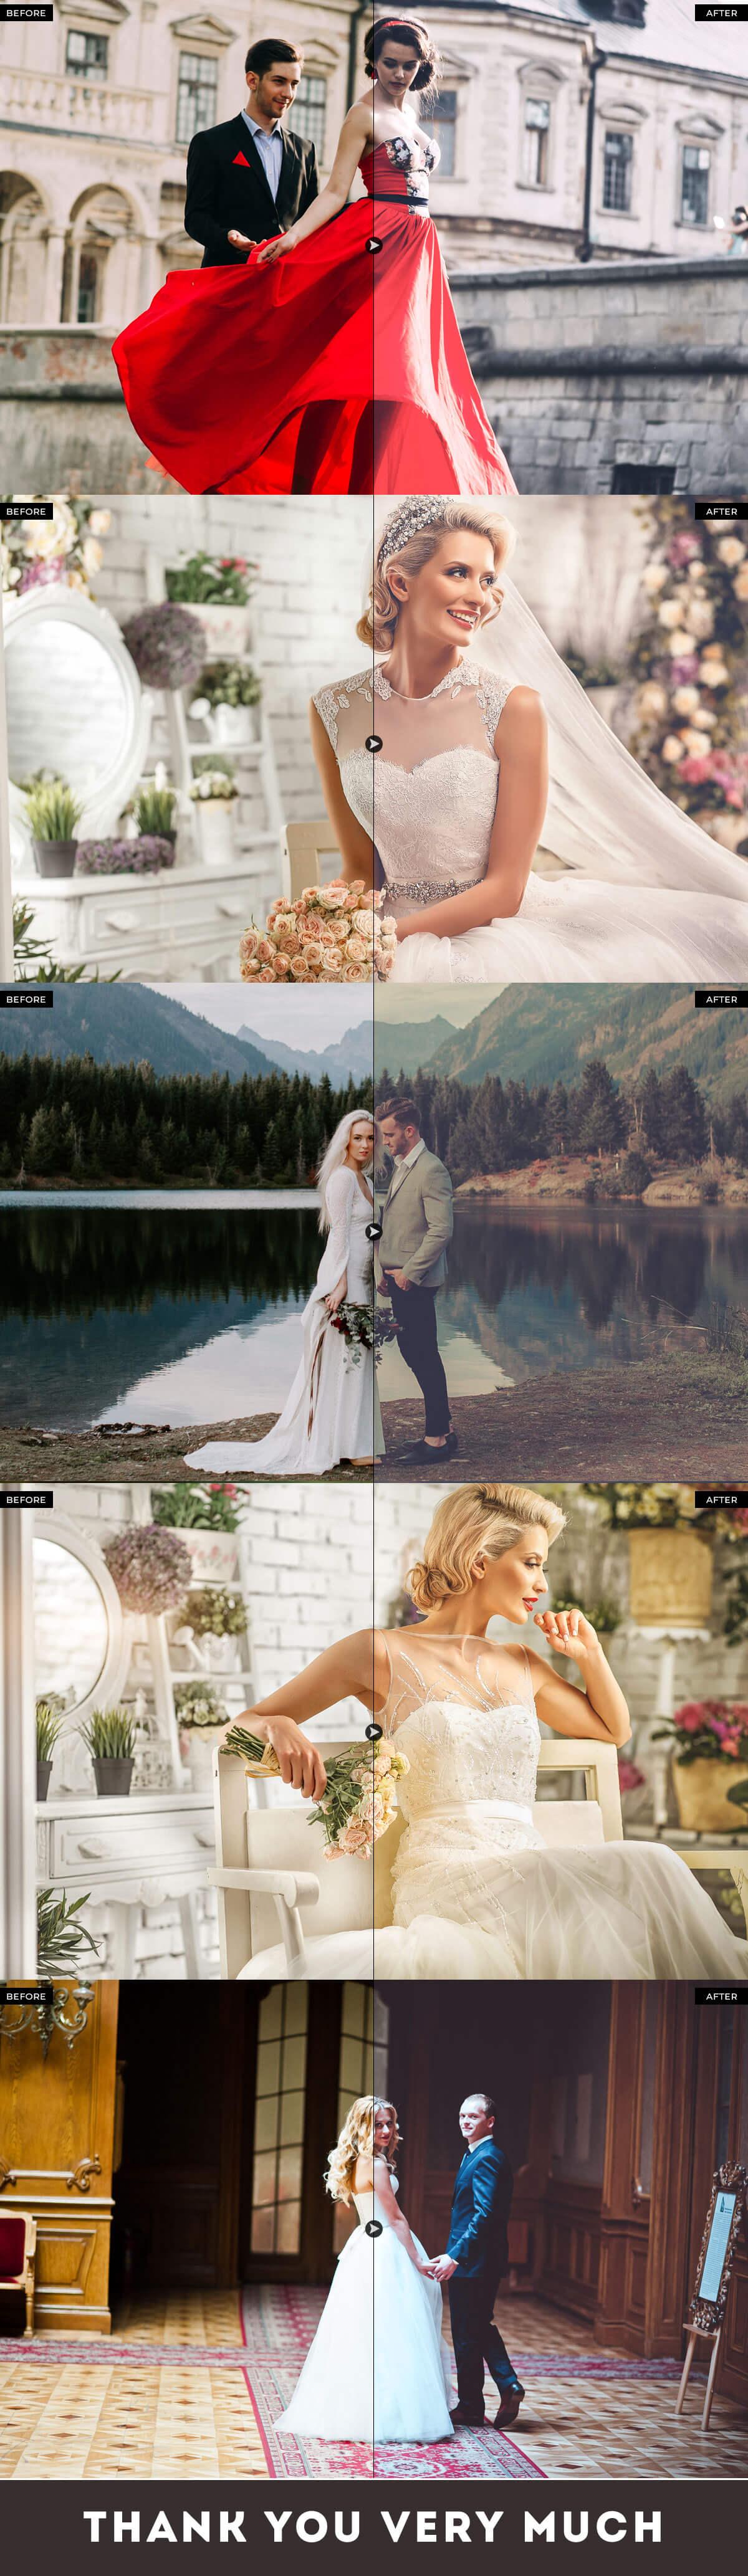 Free Royal Wedding Pro Photoshop Actions - Creativetacos